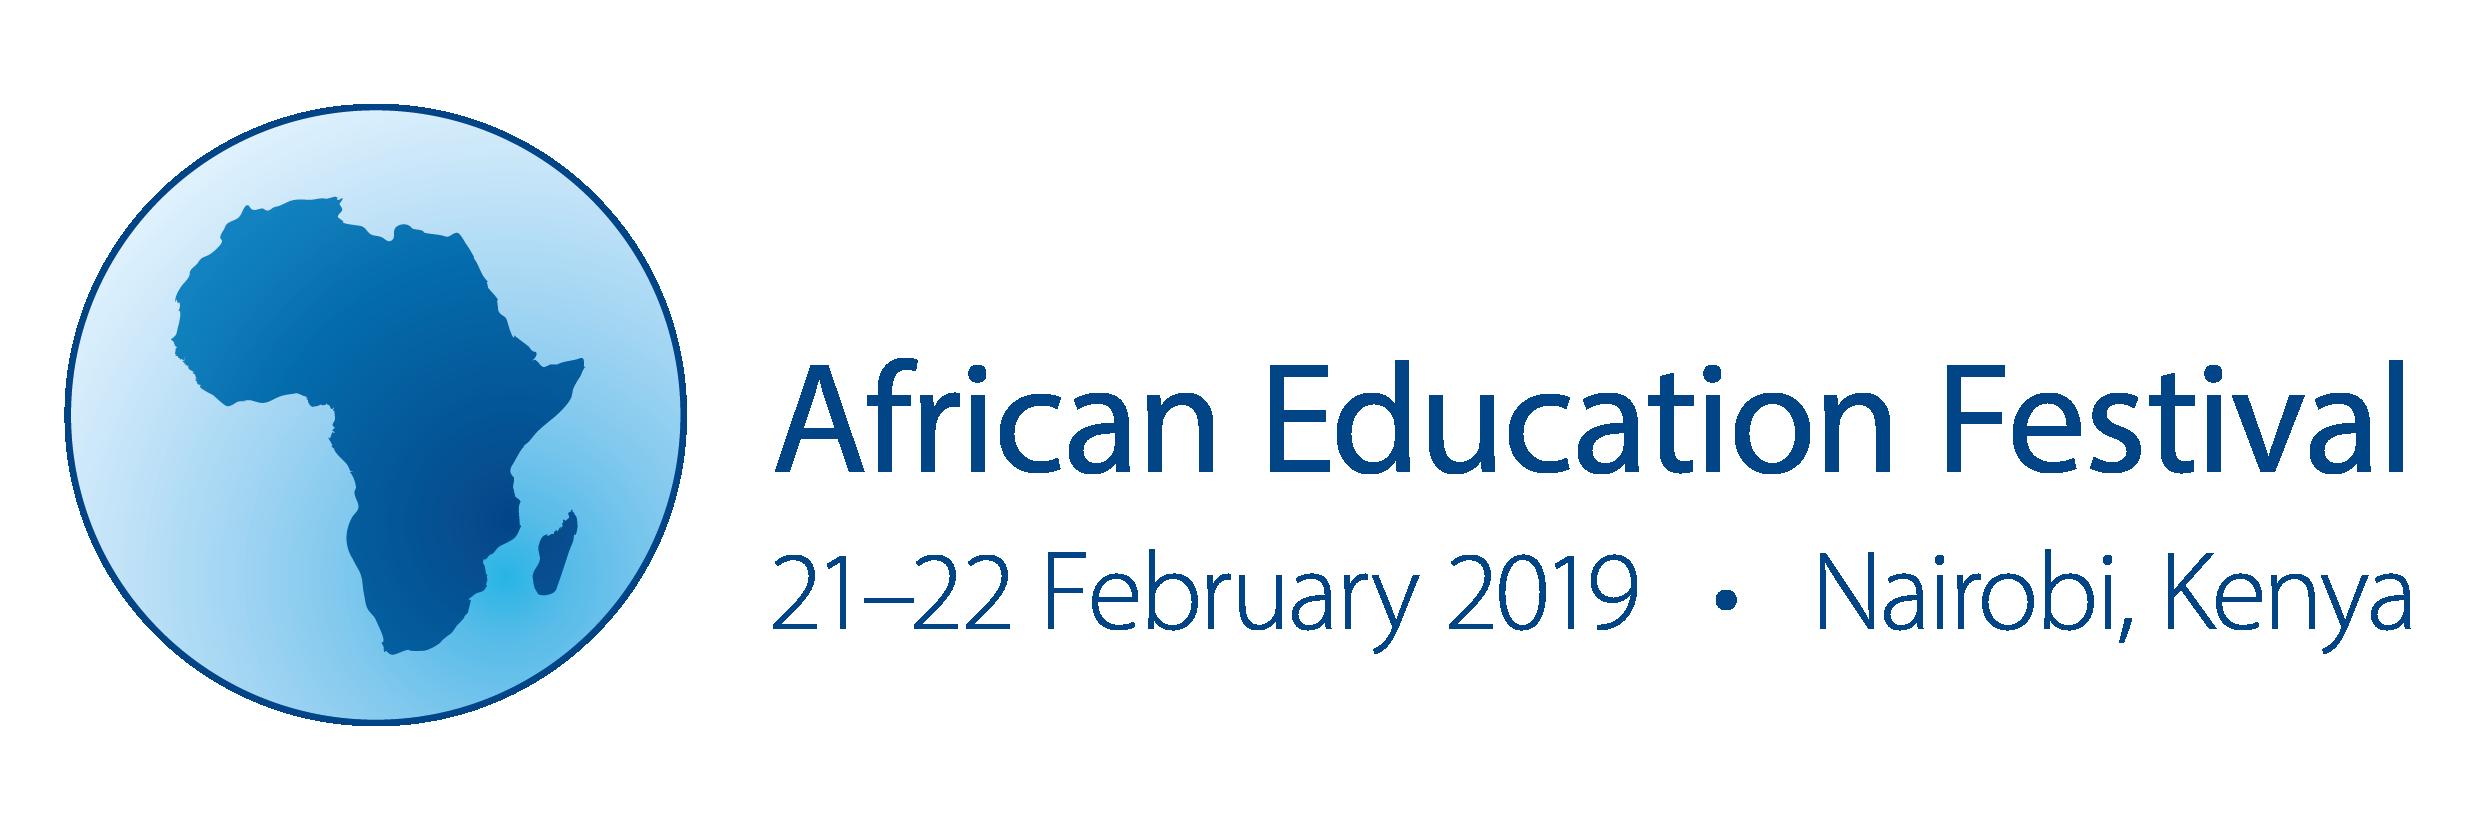 African Education Festival 2019